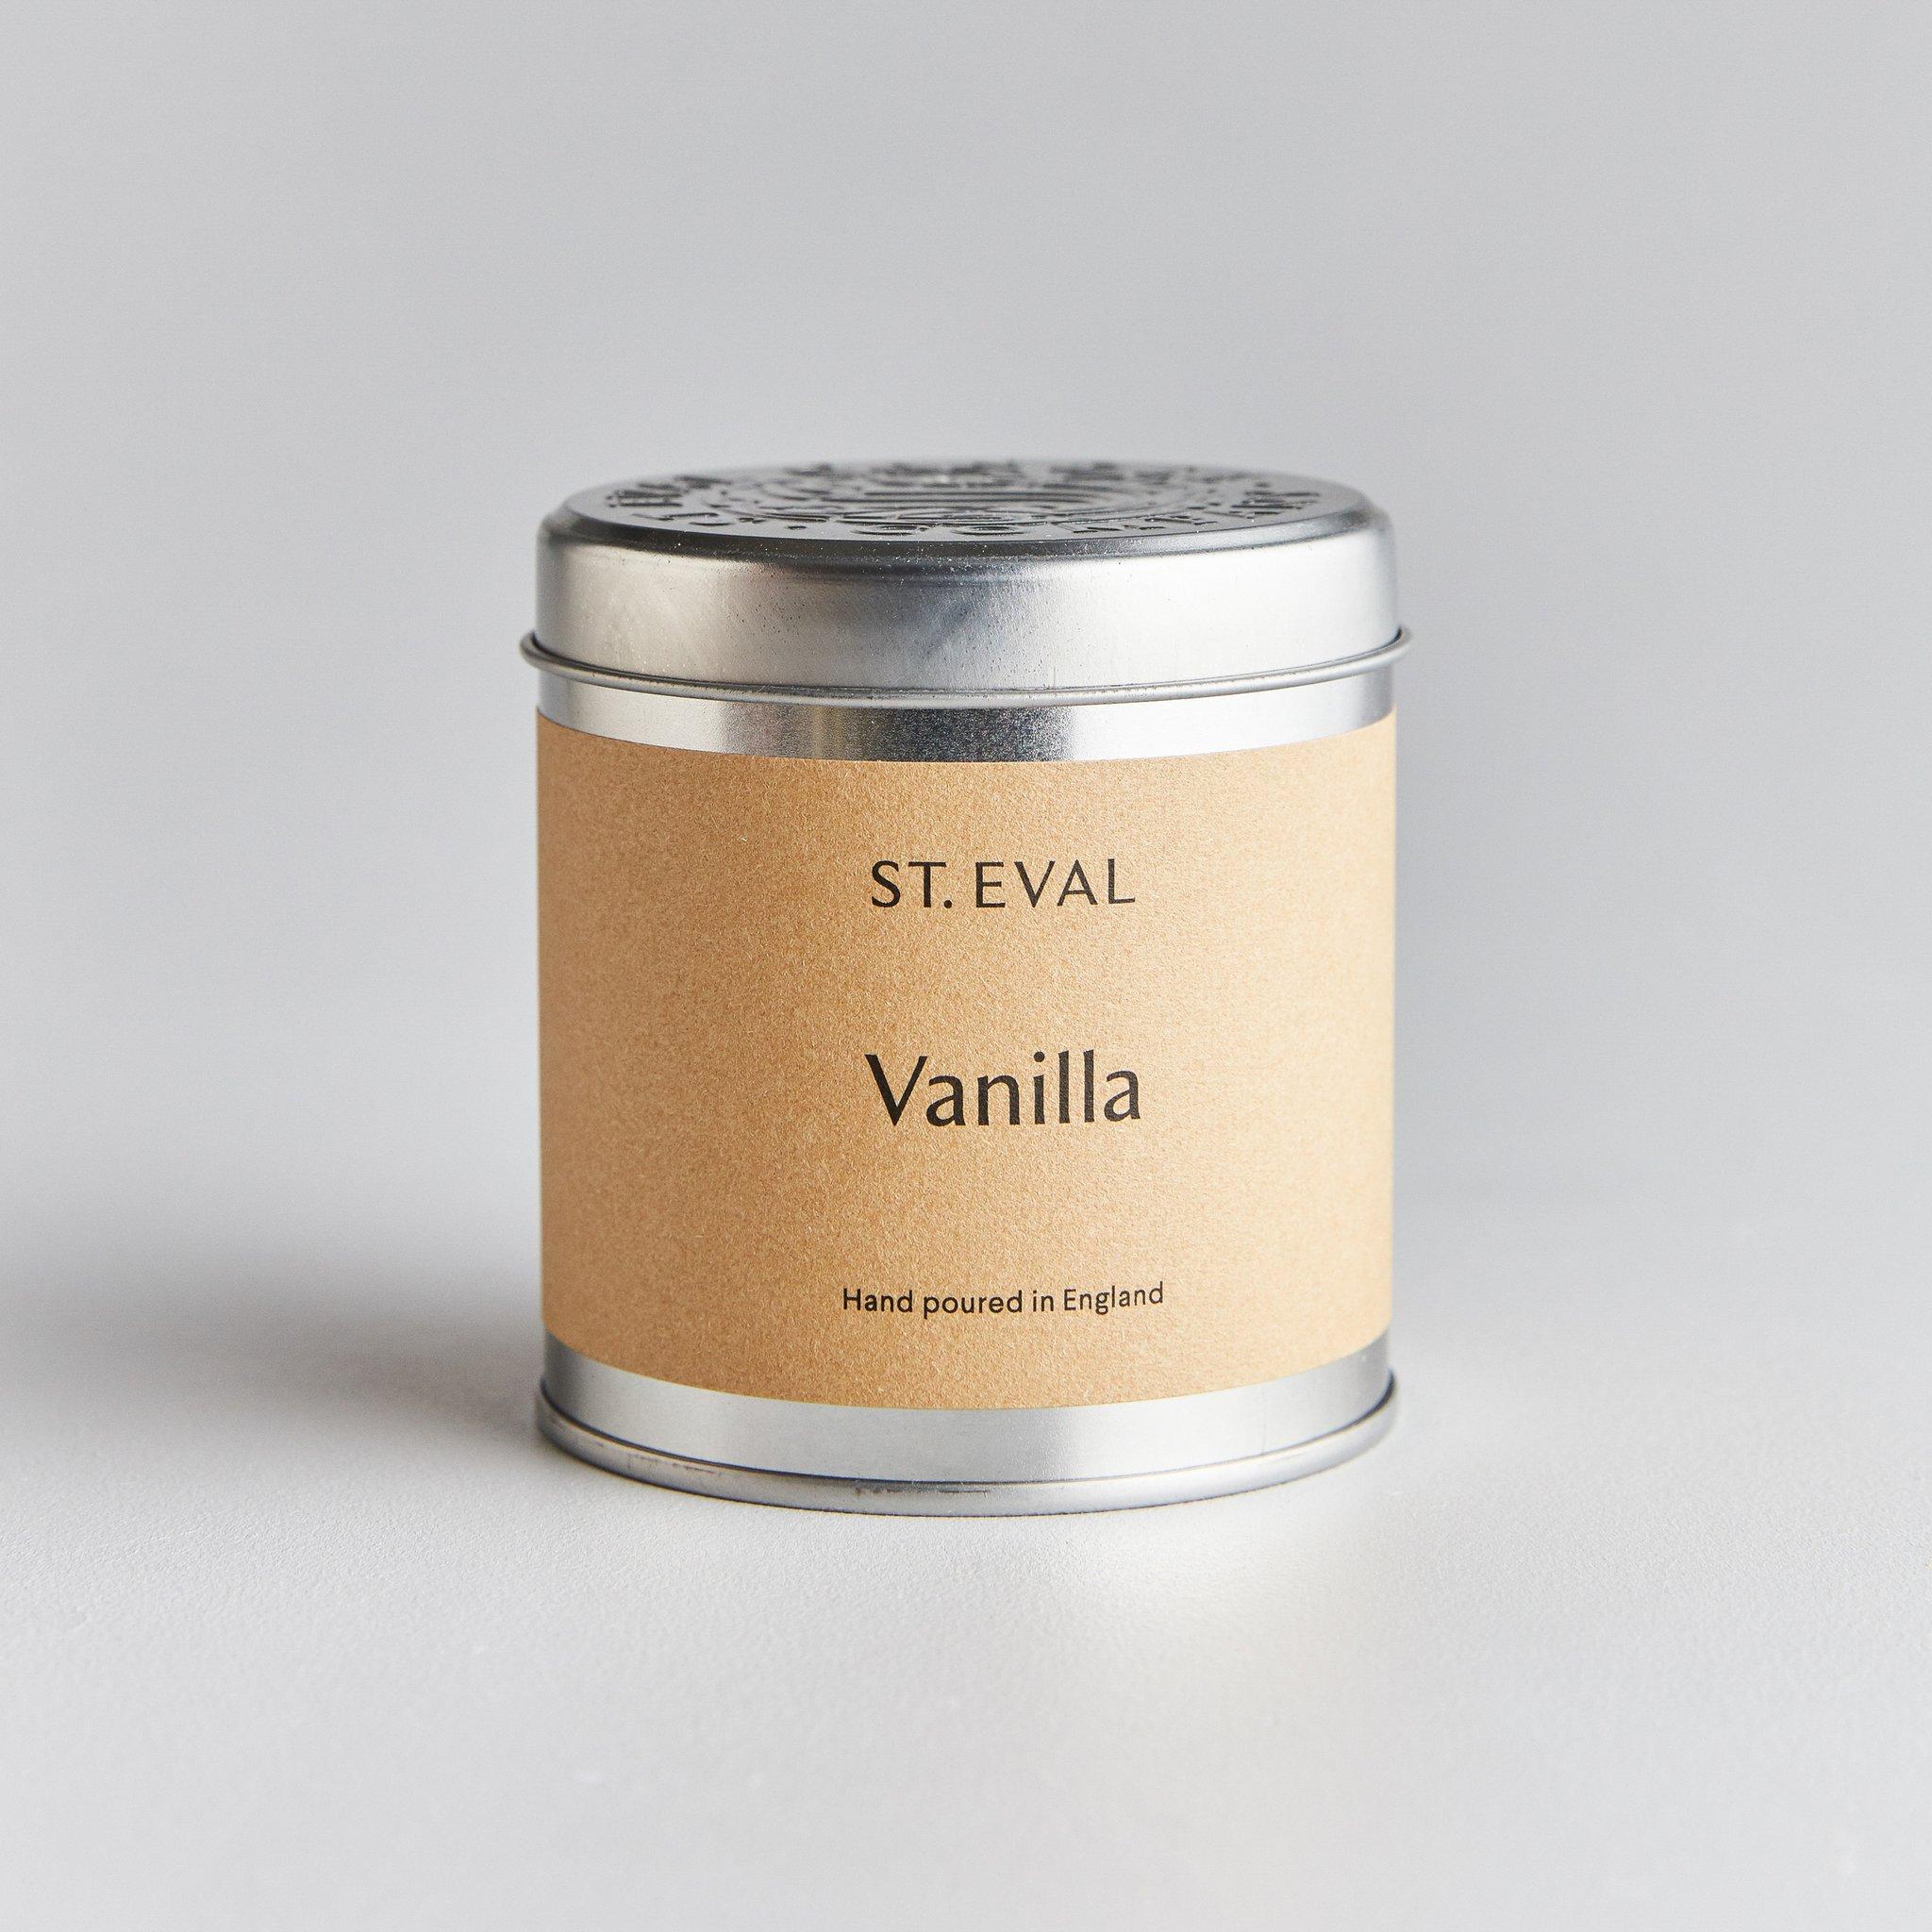 St Eval Candle Tin - Vanilla